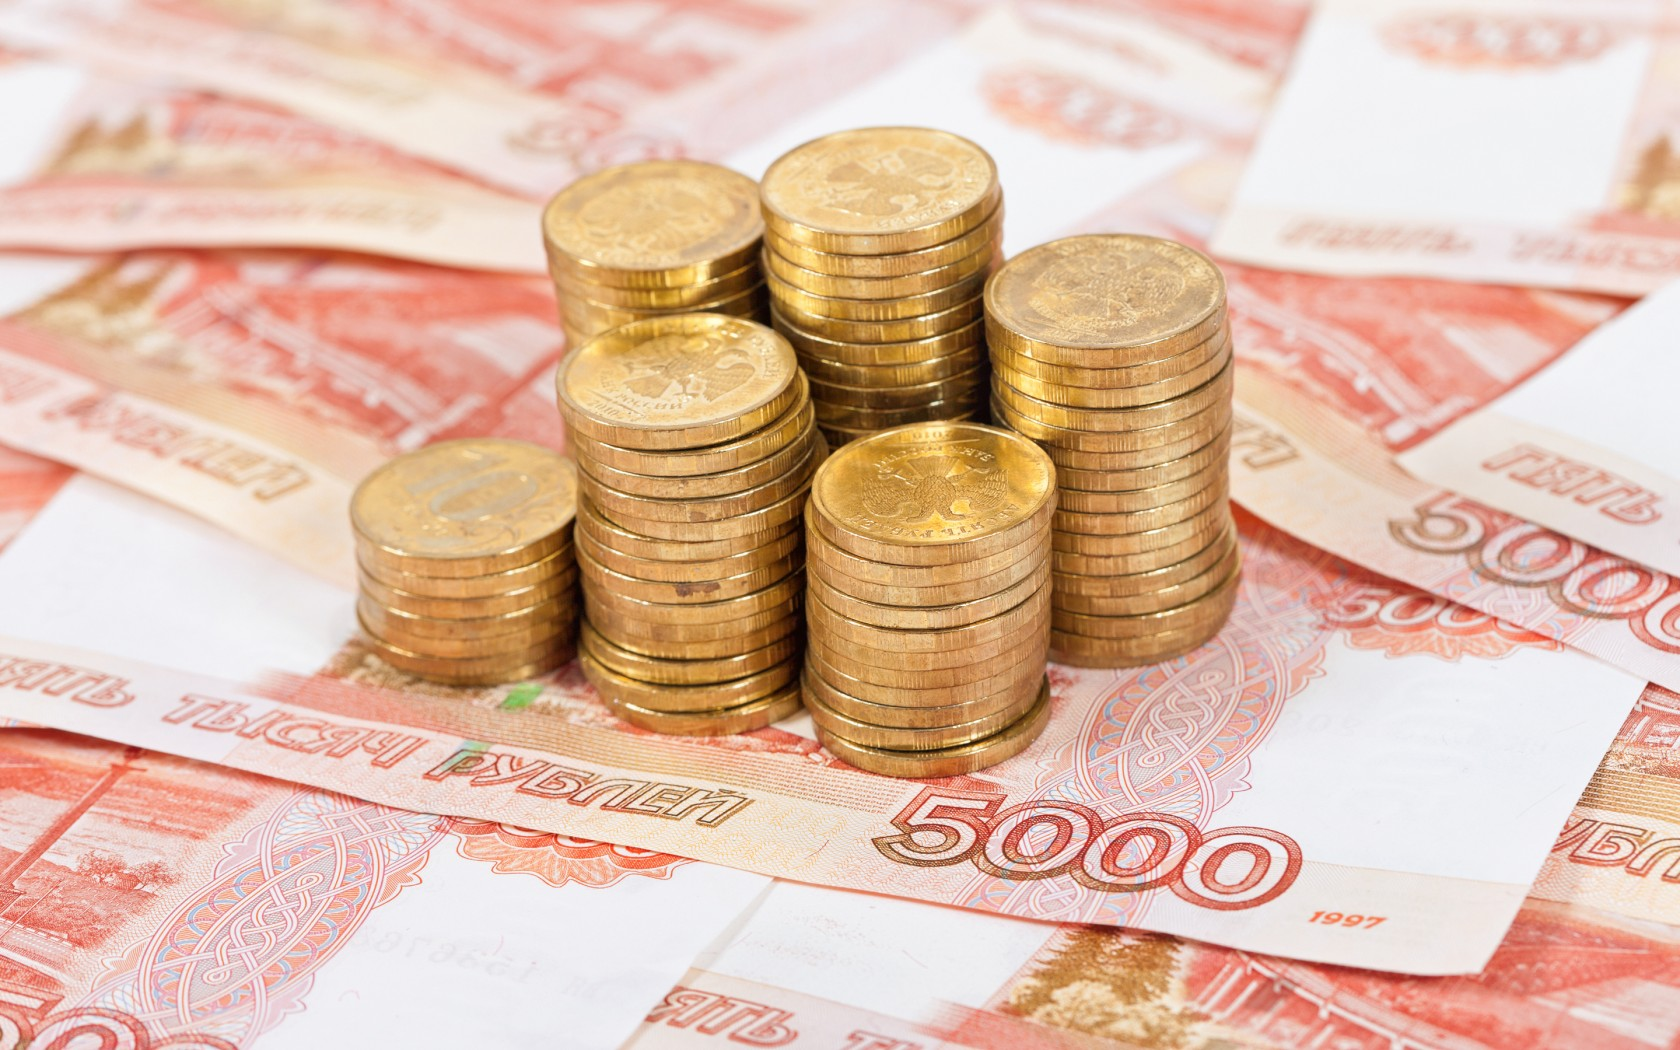 otlichie_deneg_ot_finansov